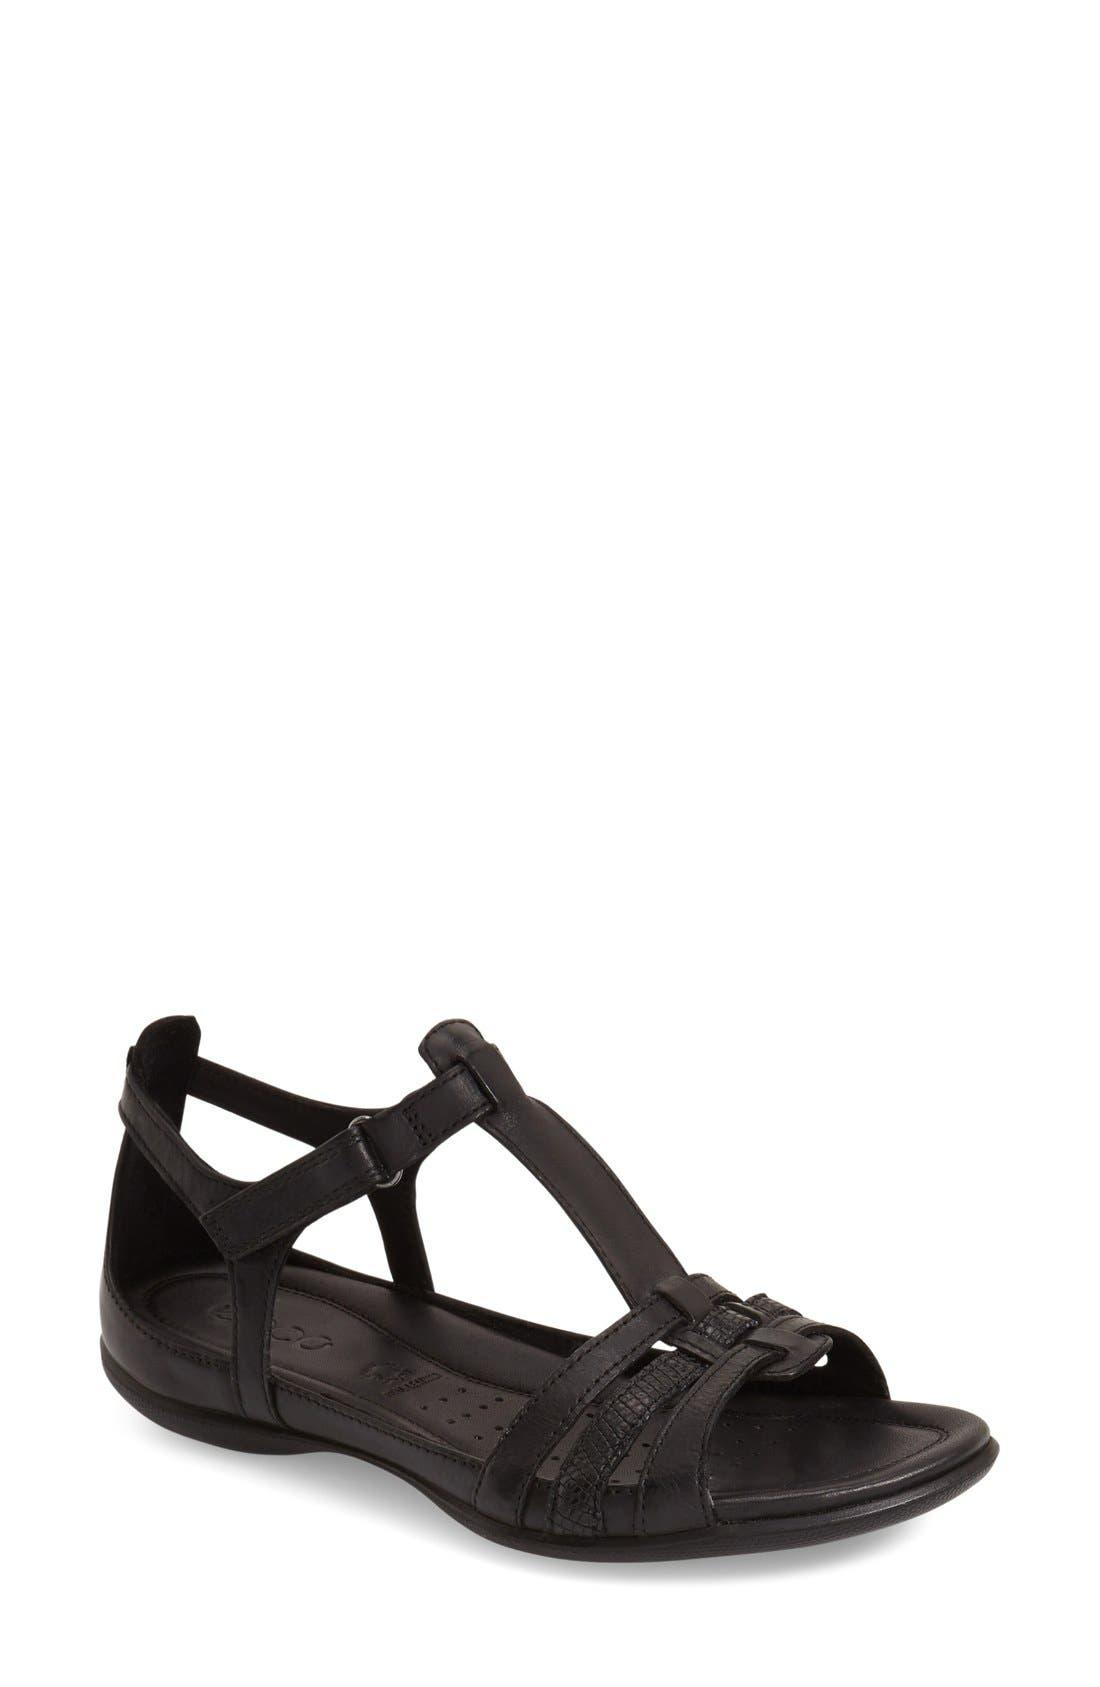 Main Image - ECCO 'Flash' Sandal (Women)